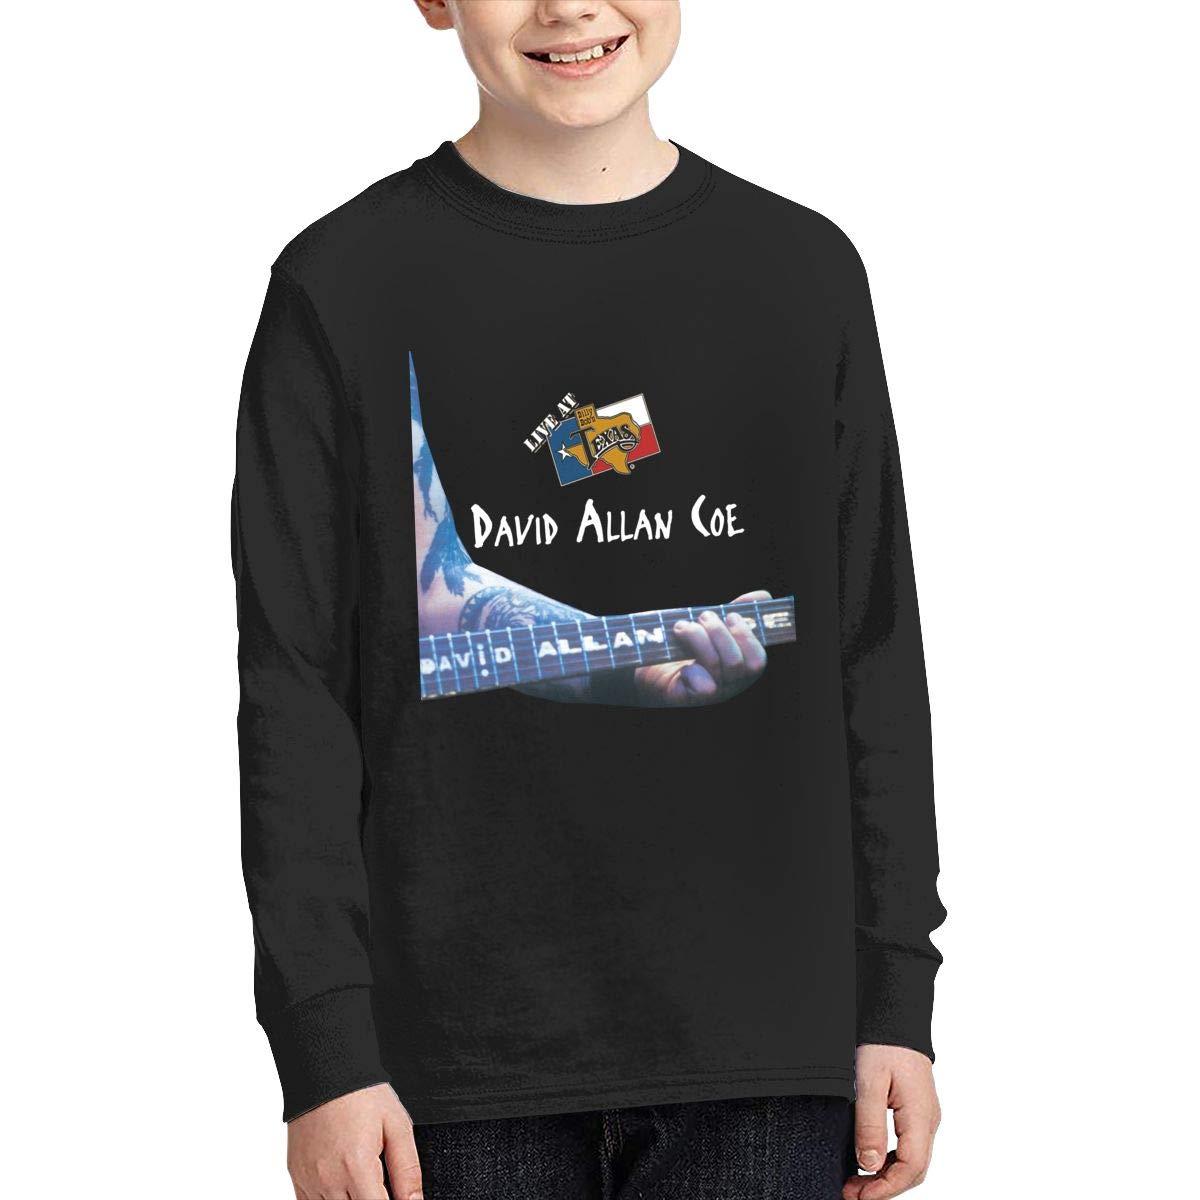 RhteGui David Allen Coe Boys /& Girls Junior Vintage Long Sleeve T-Shirt Black